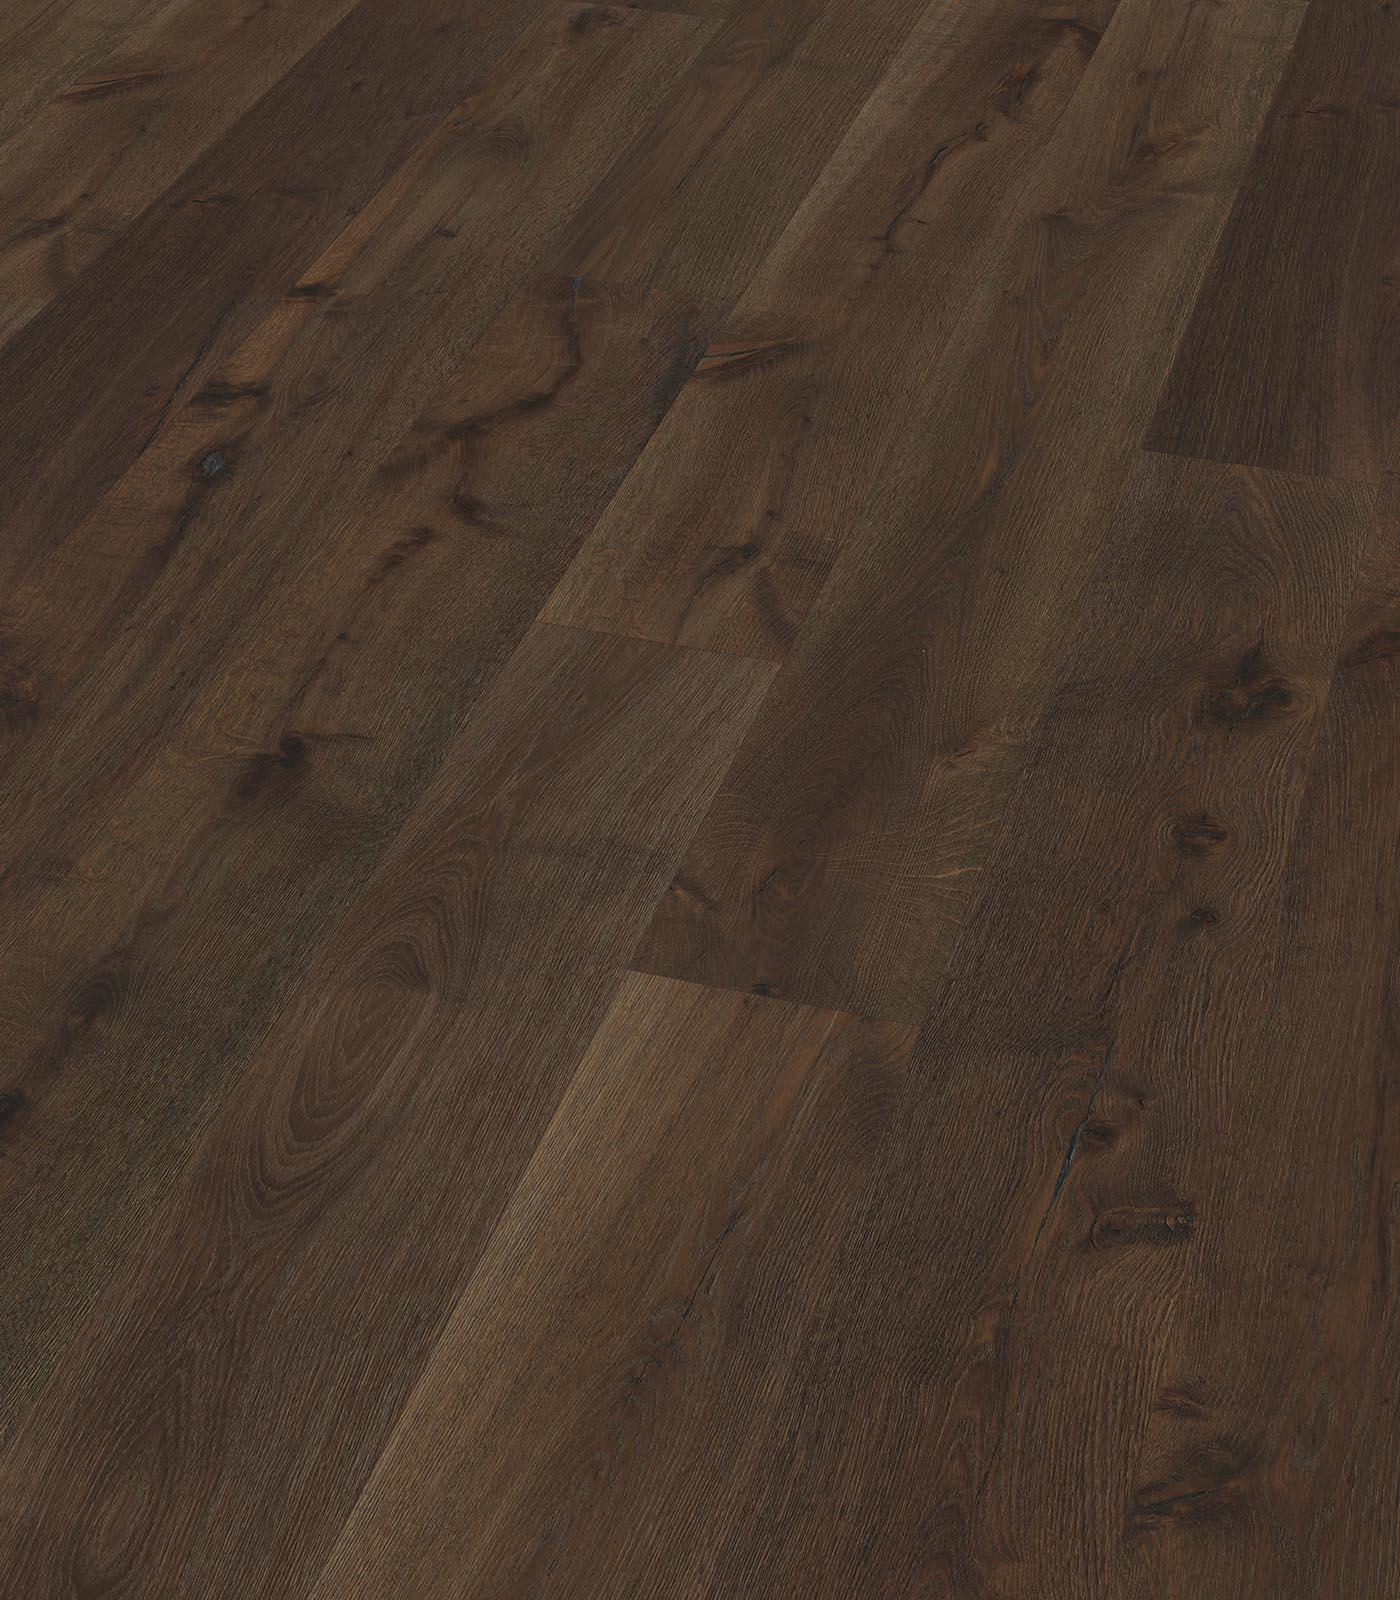 Azores-Variante Collection-European Oak floors-angle